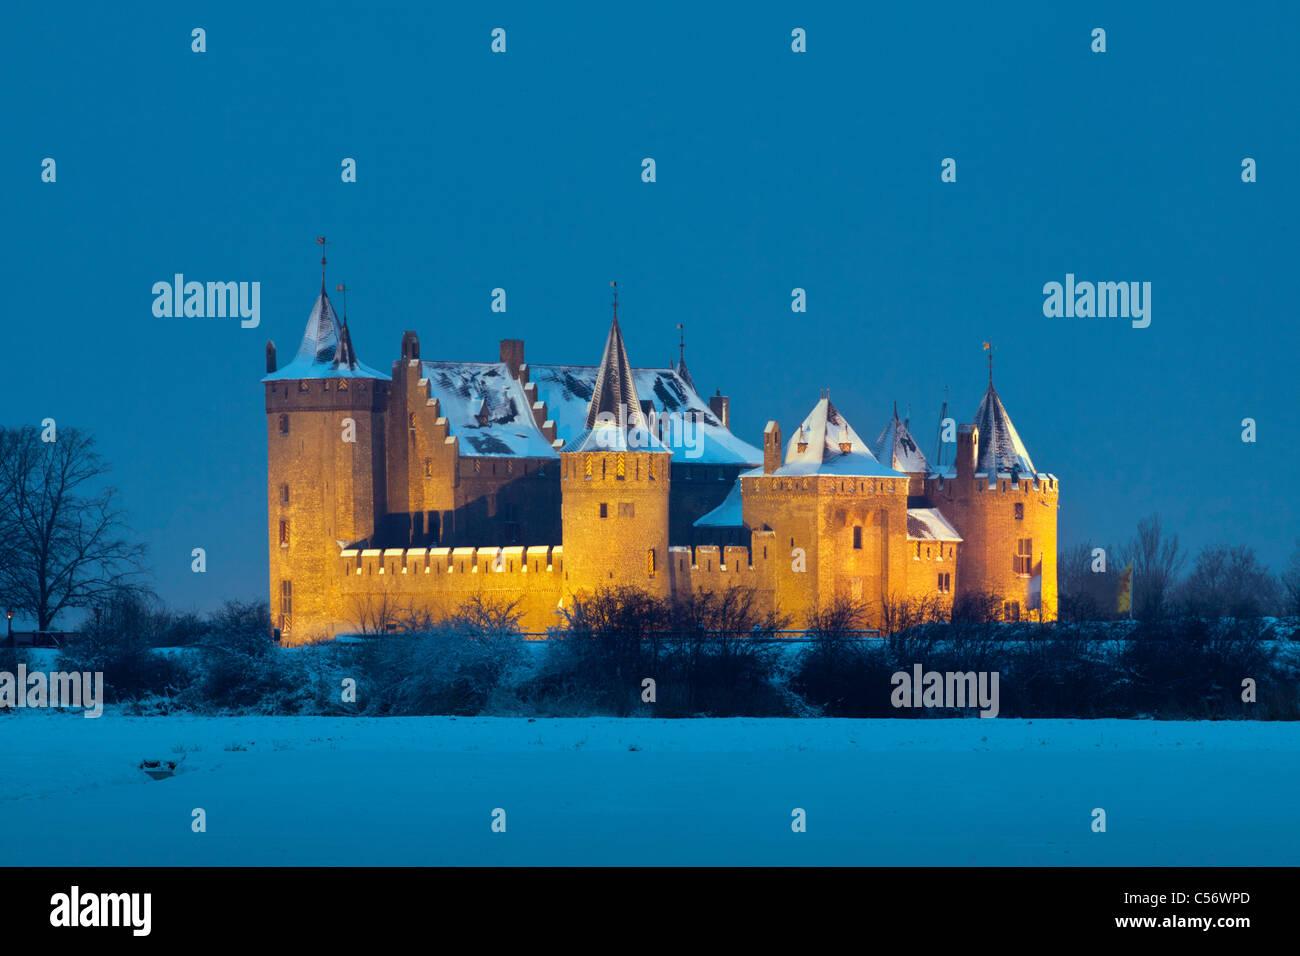 Niederlande, Muiden, Schloss Muiderslot genannt. Winter, Schnee. Stockbild